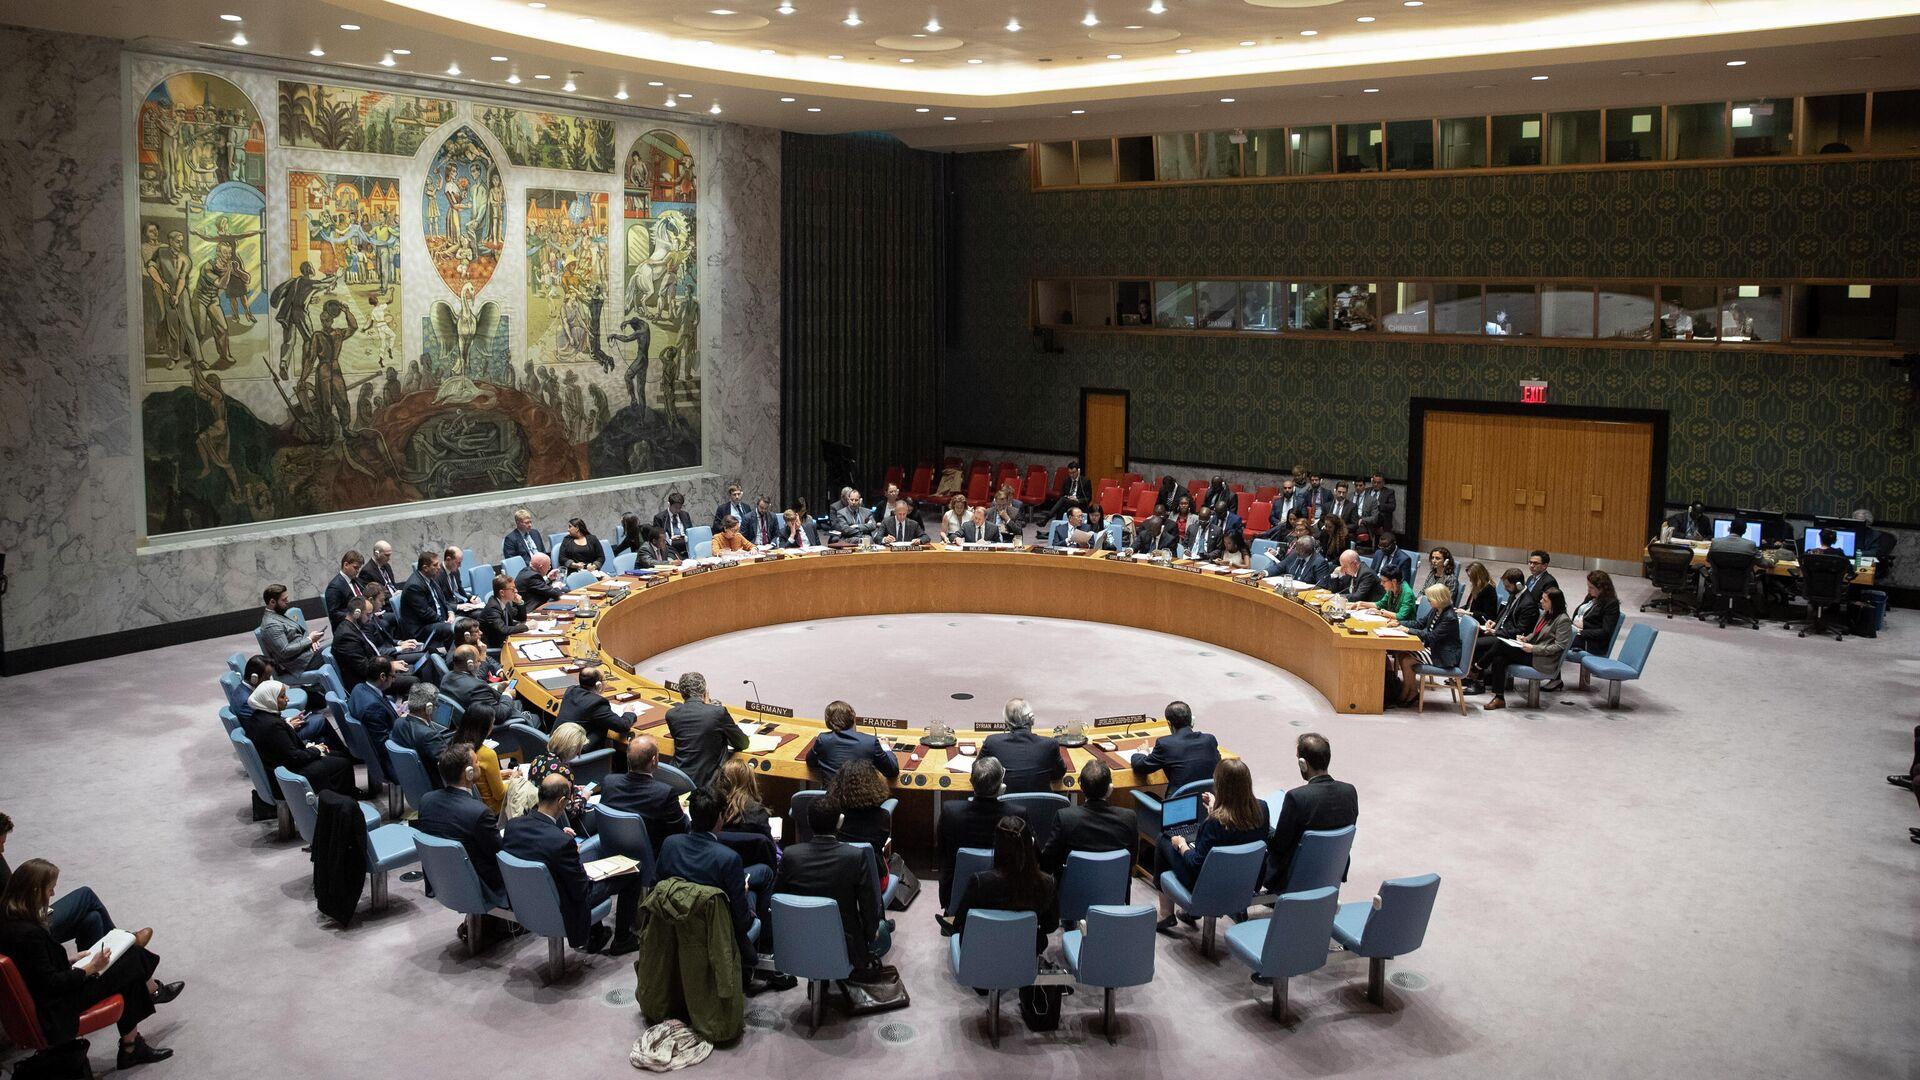 Заседание Совета Безопасности ООН - РИА Новости, 1920, 05.10.2021